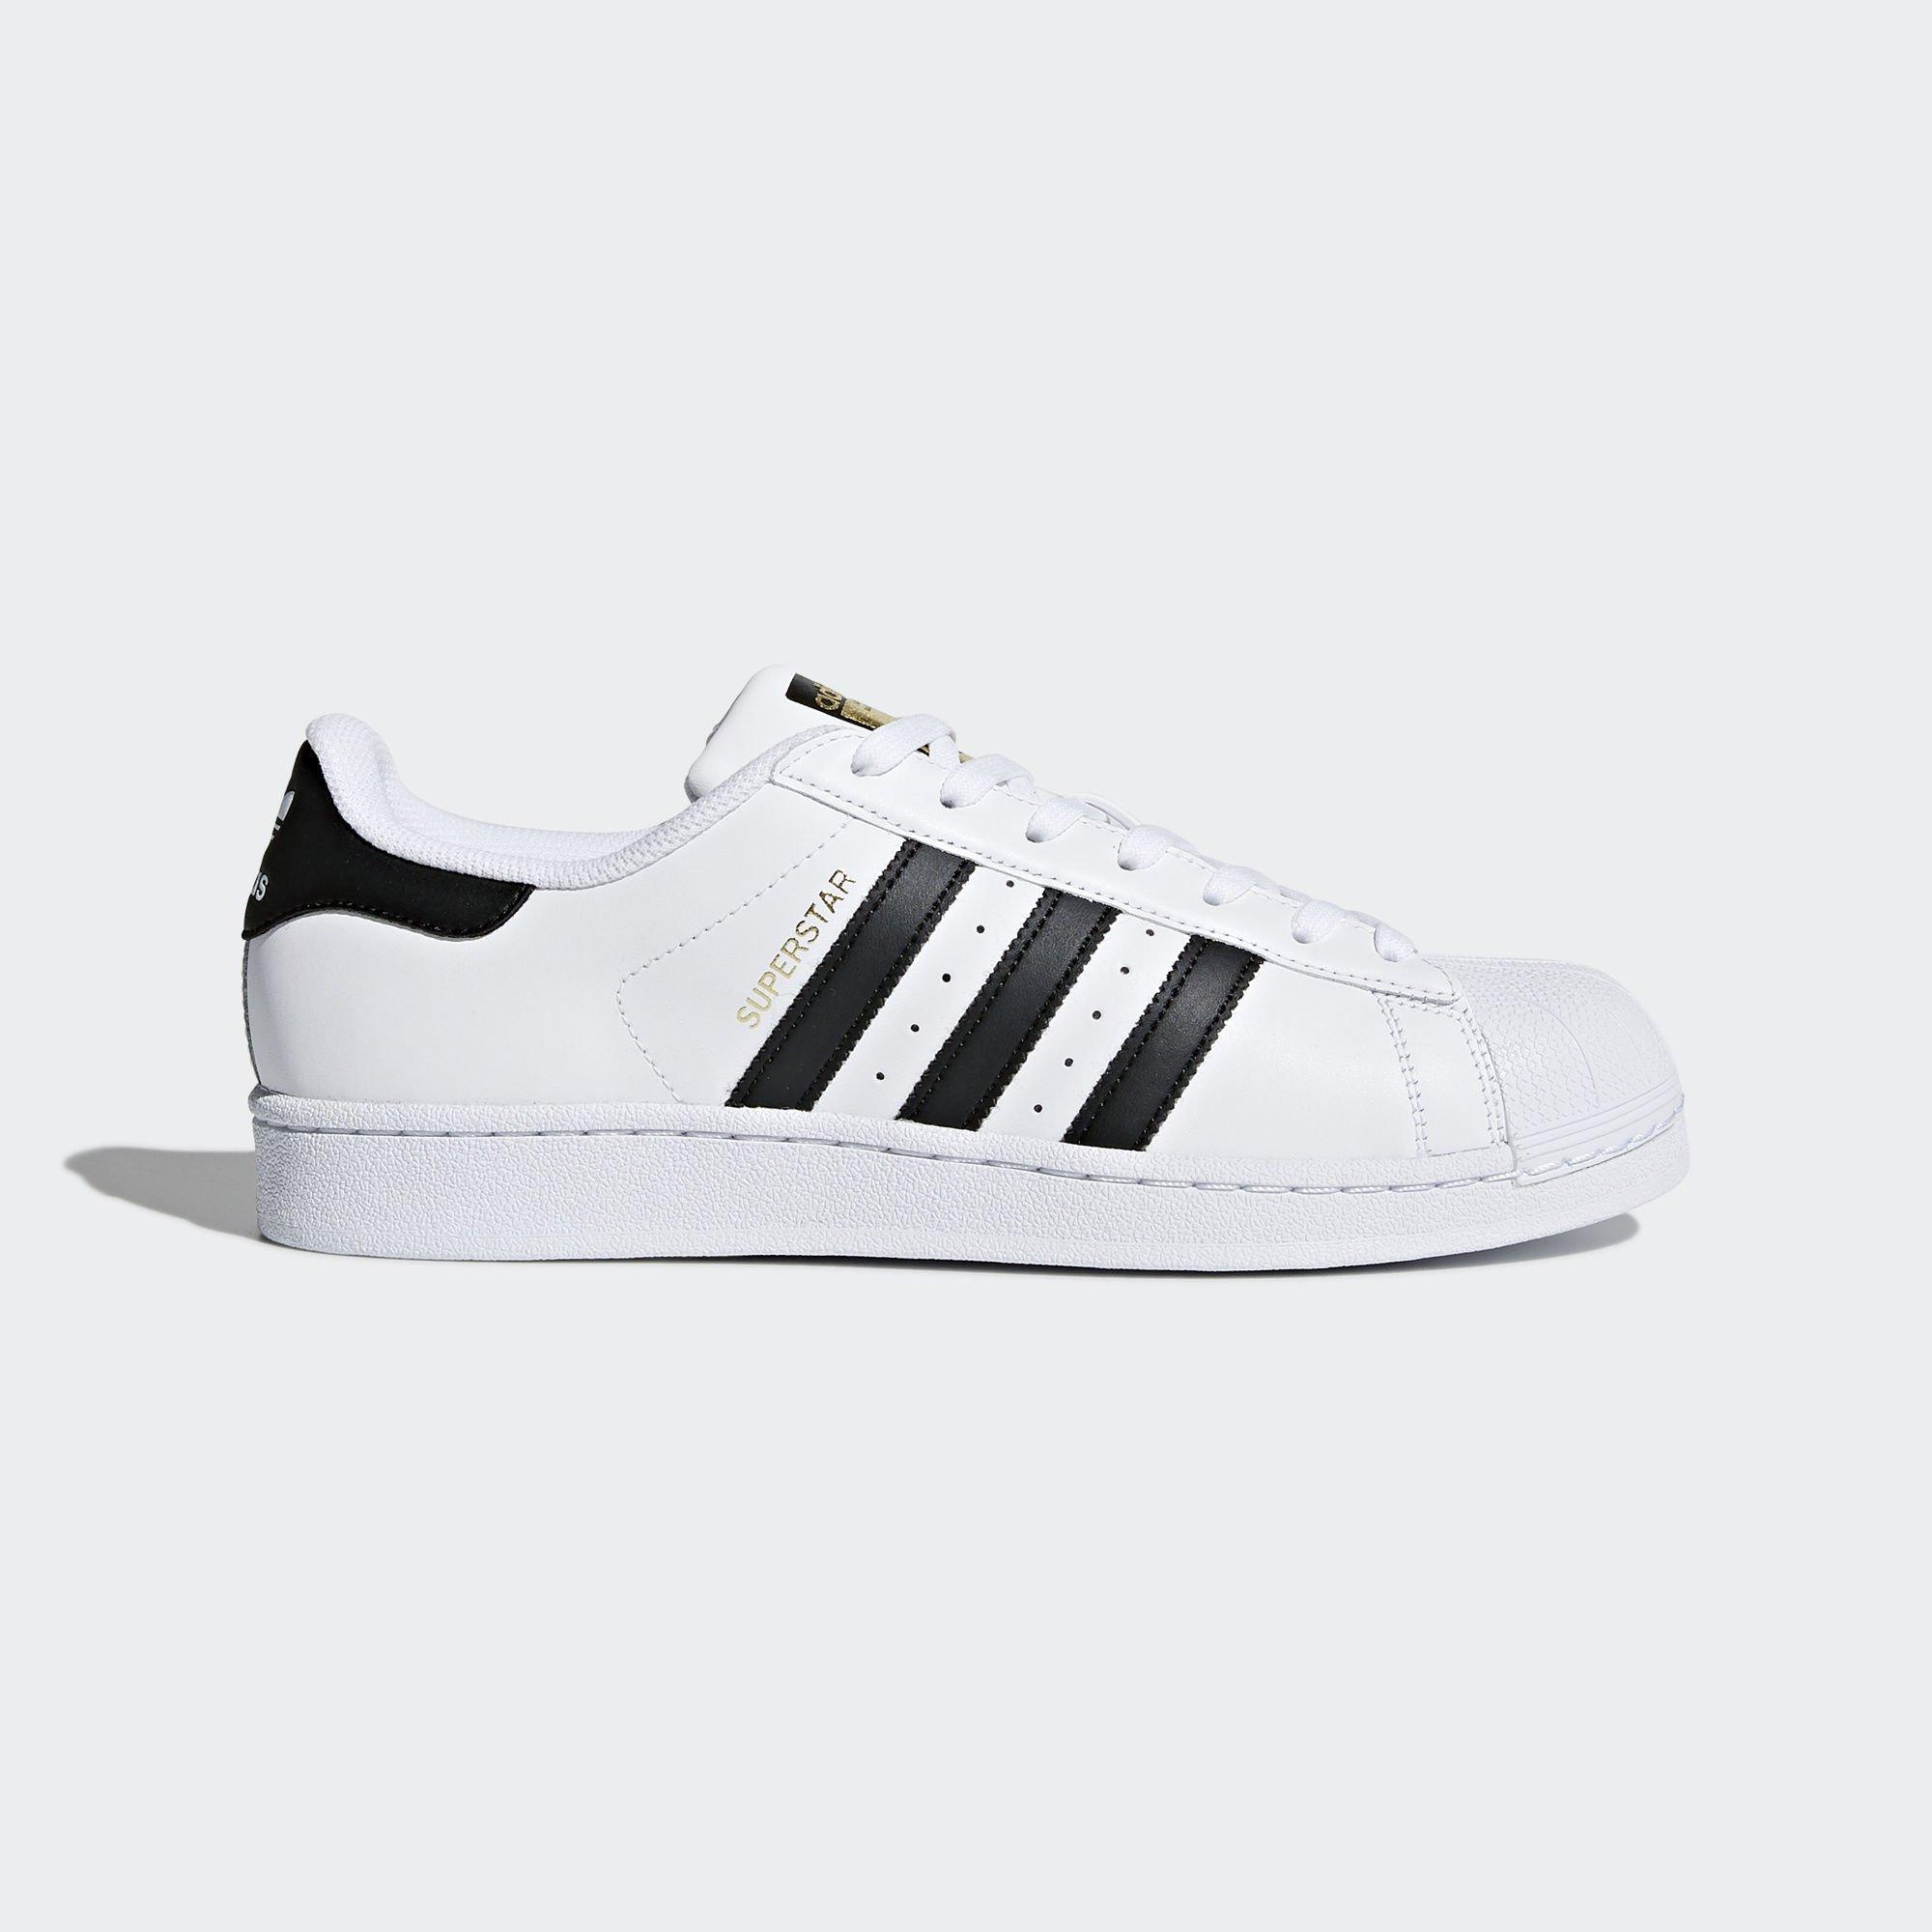 adidas Originals Men's Superstar Casual Running Shoe, Core Black/White, ((13 M US) by adidas Originals